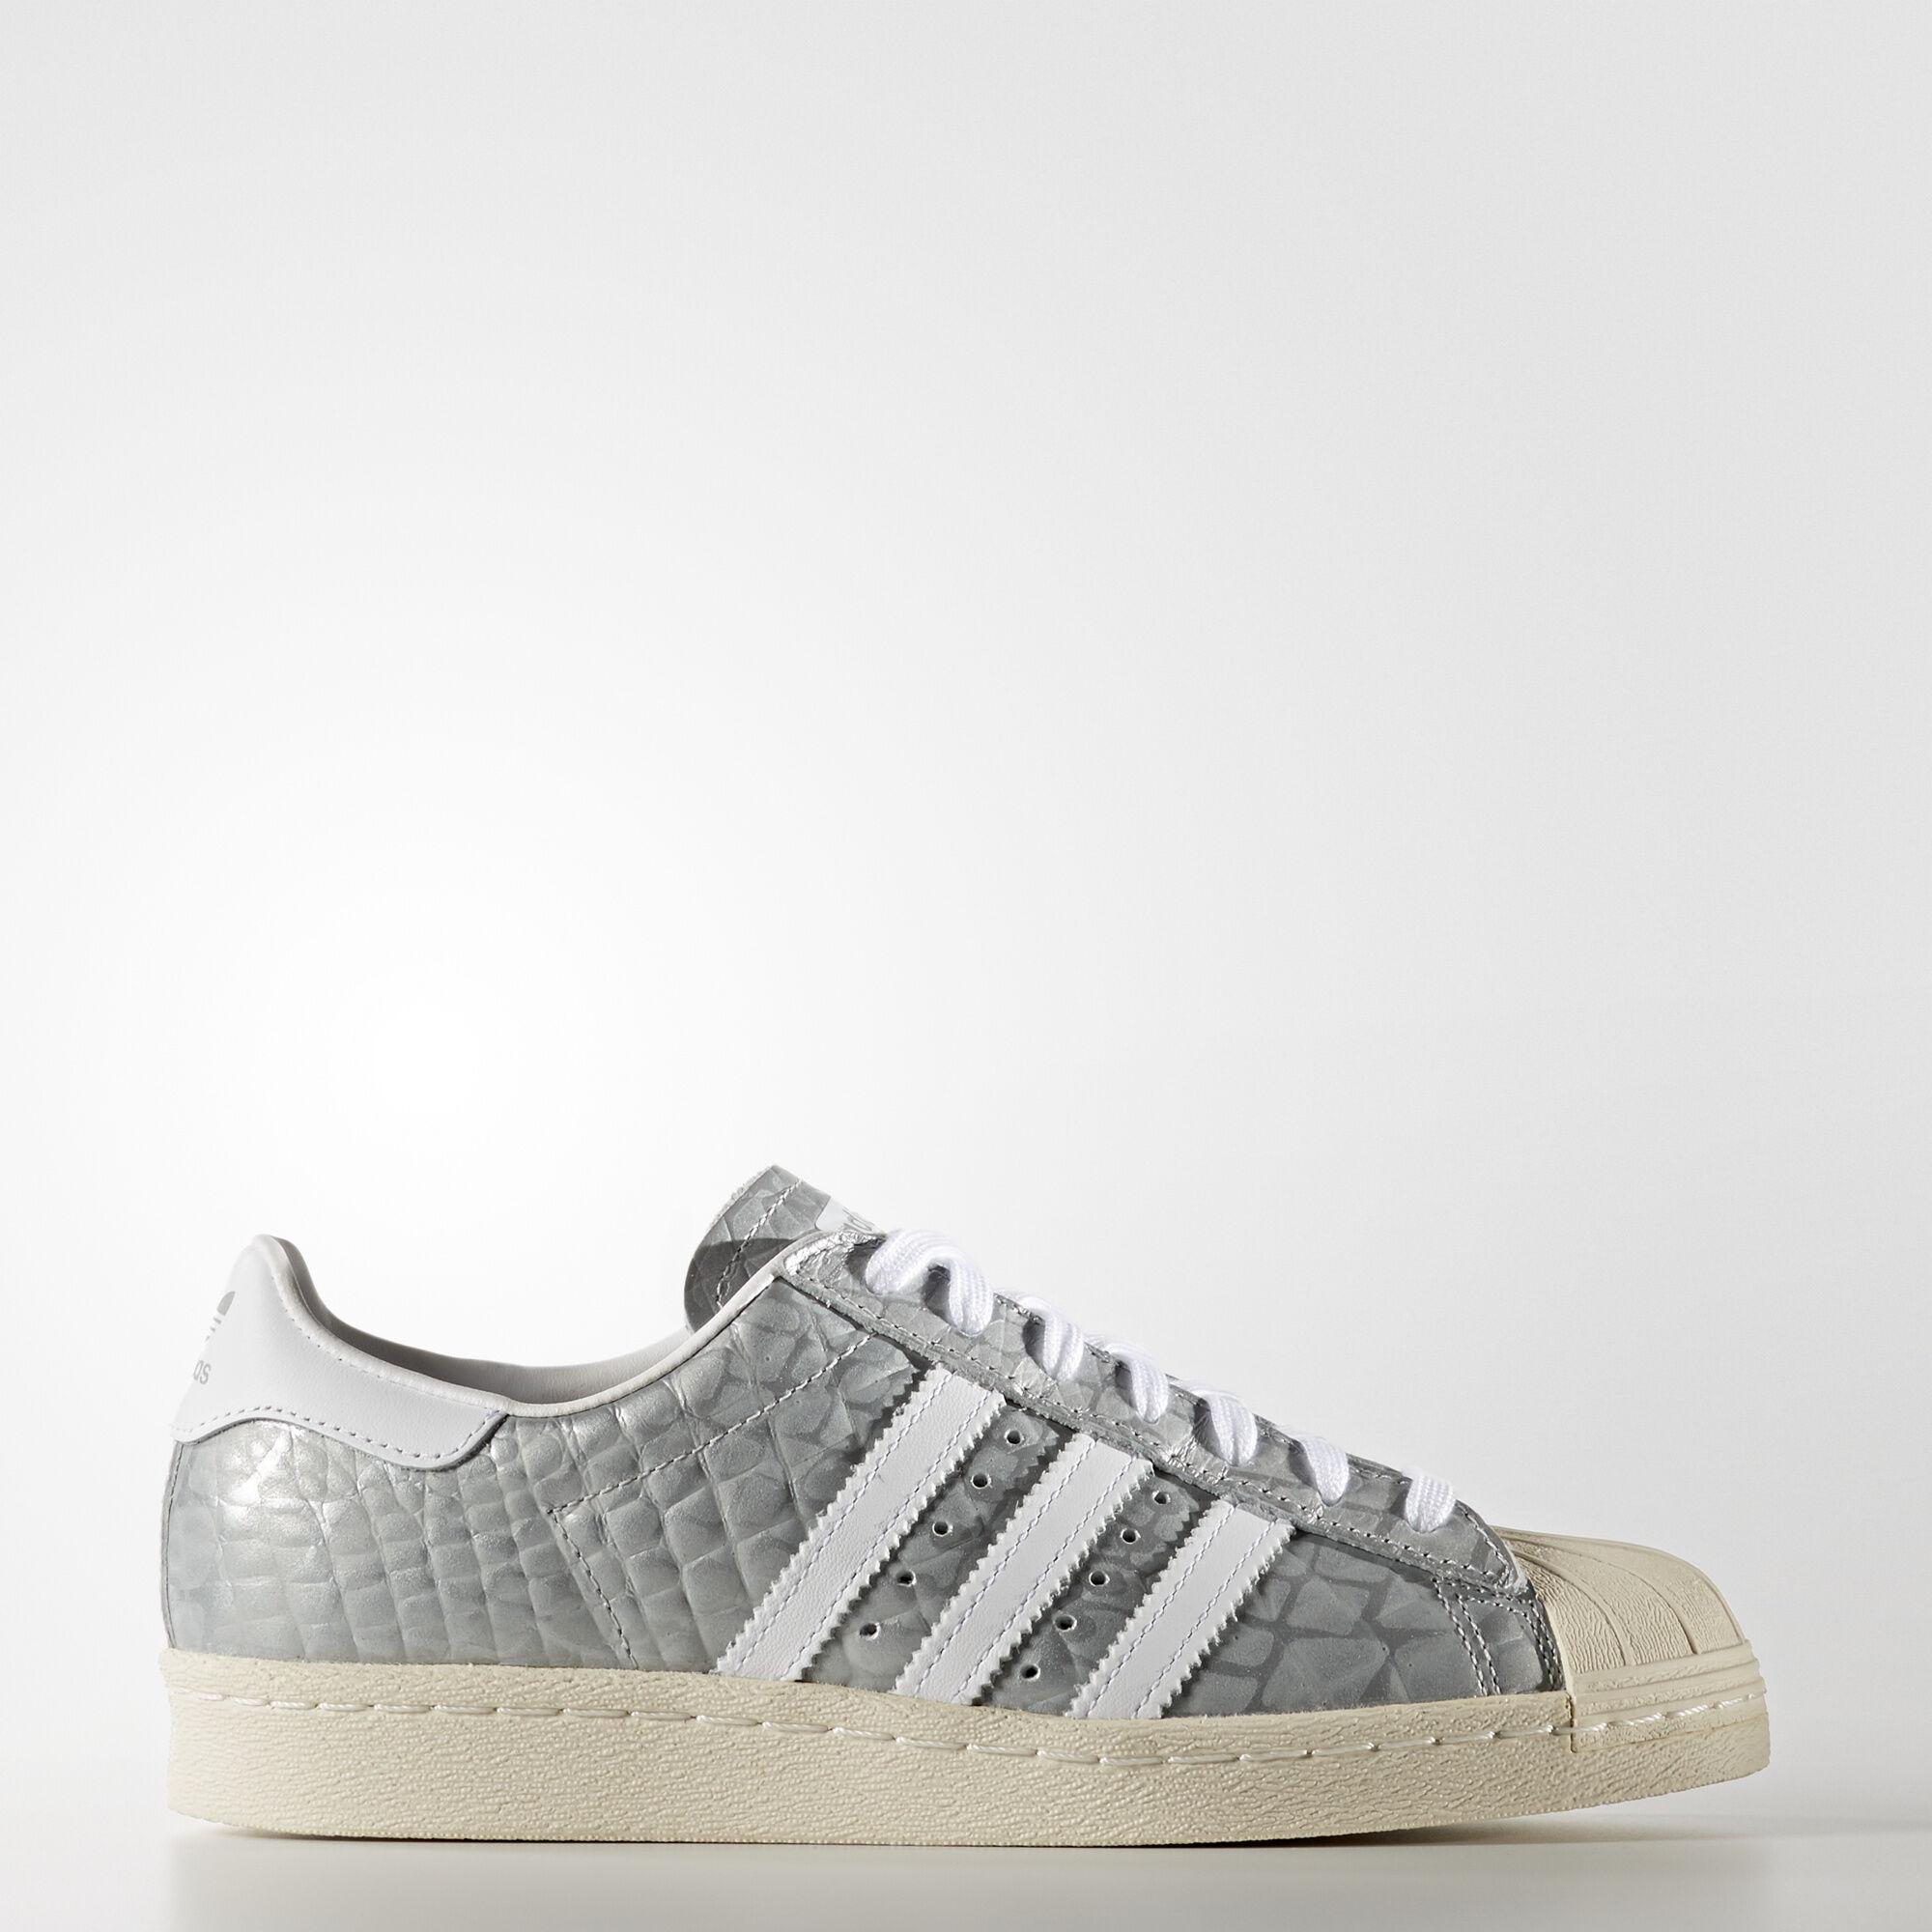 Adidas All Stars Blancas